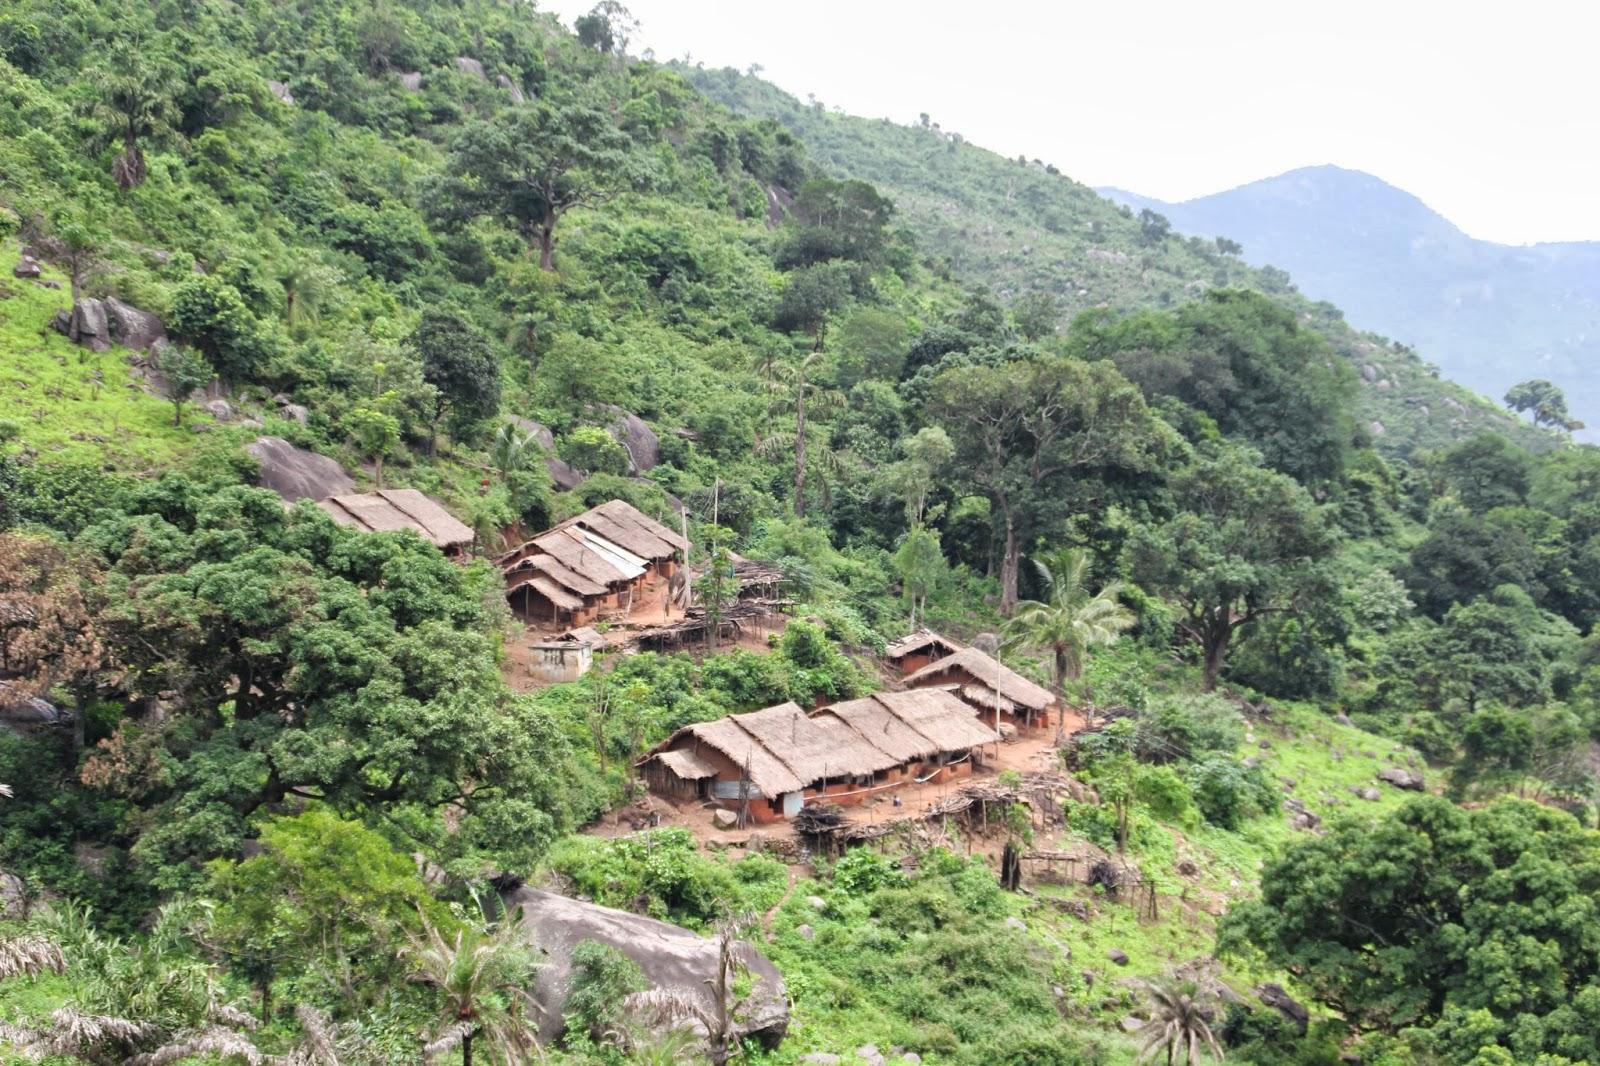 Village below Mahendragiri